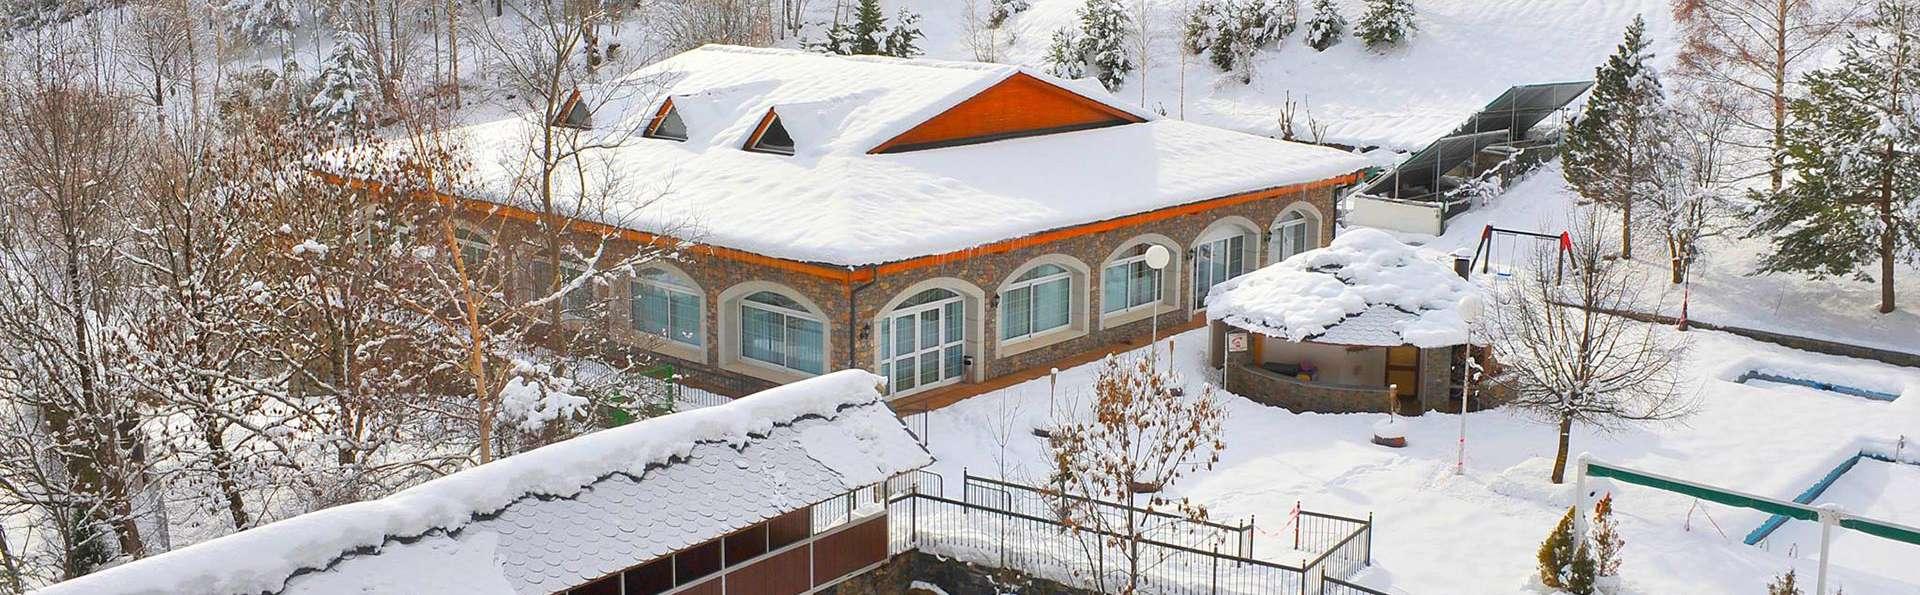 Hotel Sant Gothard - edit_front_winter1.jpg